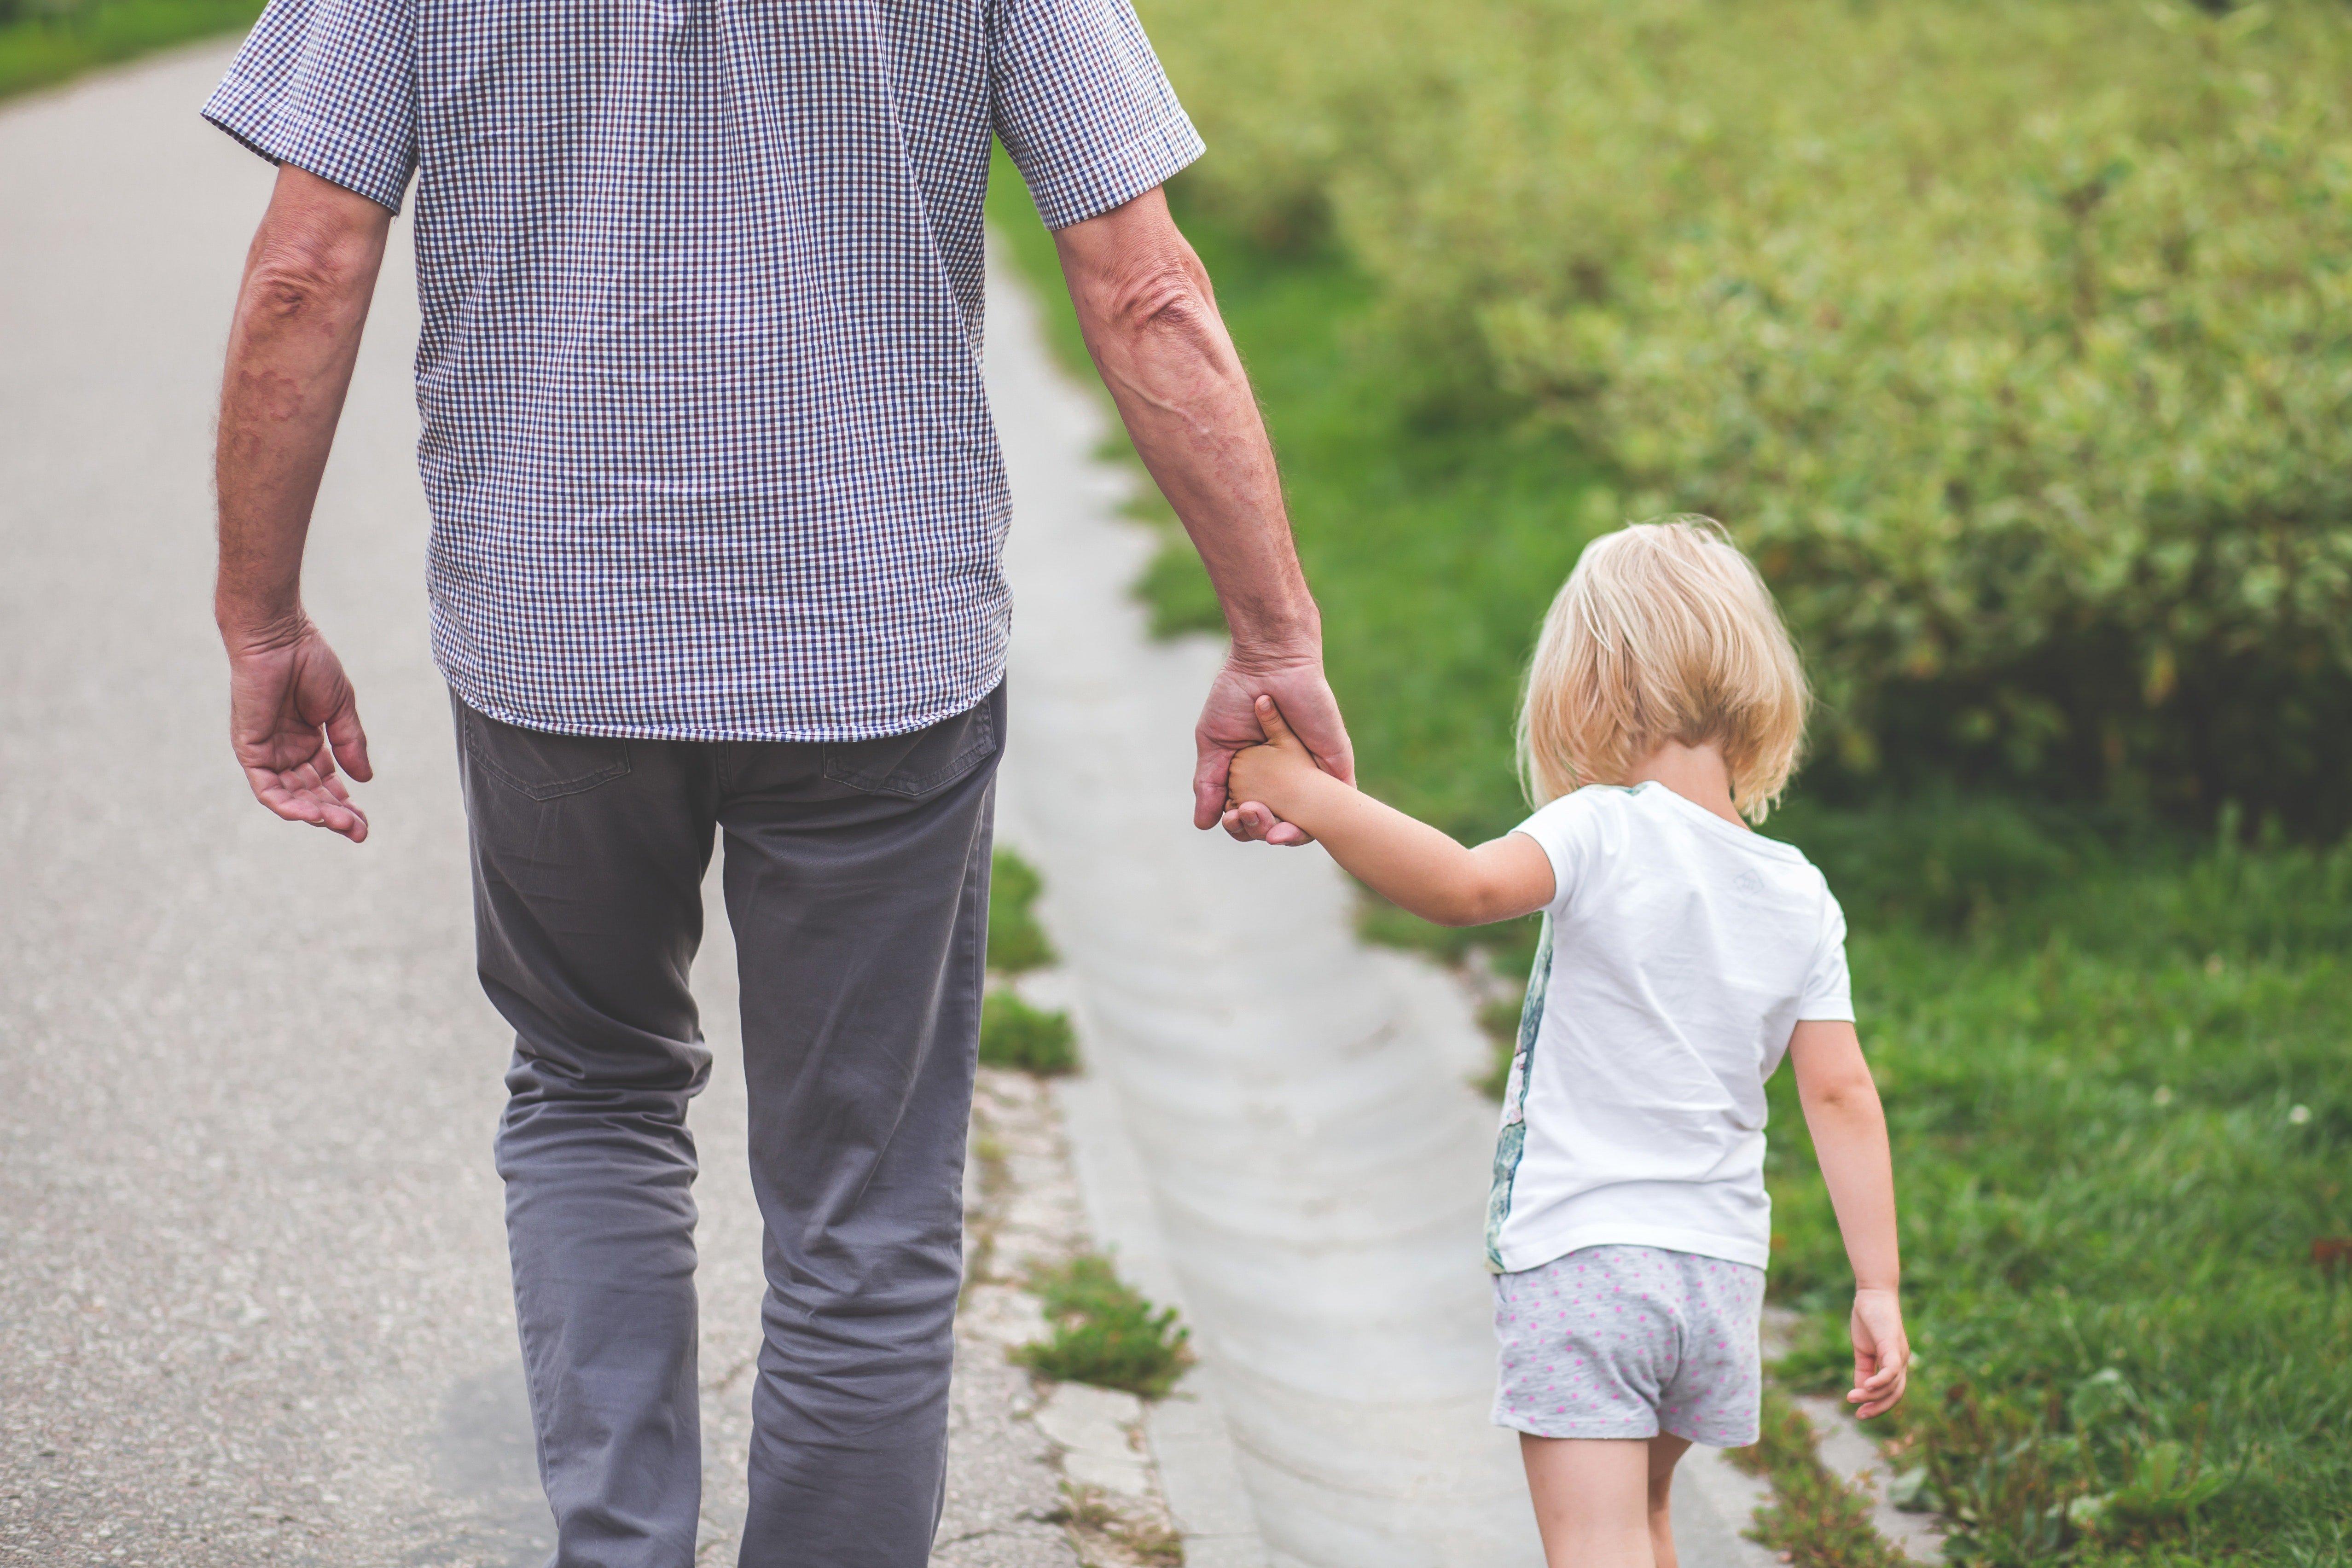 Grandparent walking with grandchild